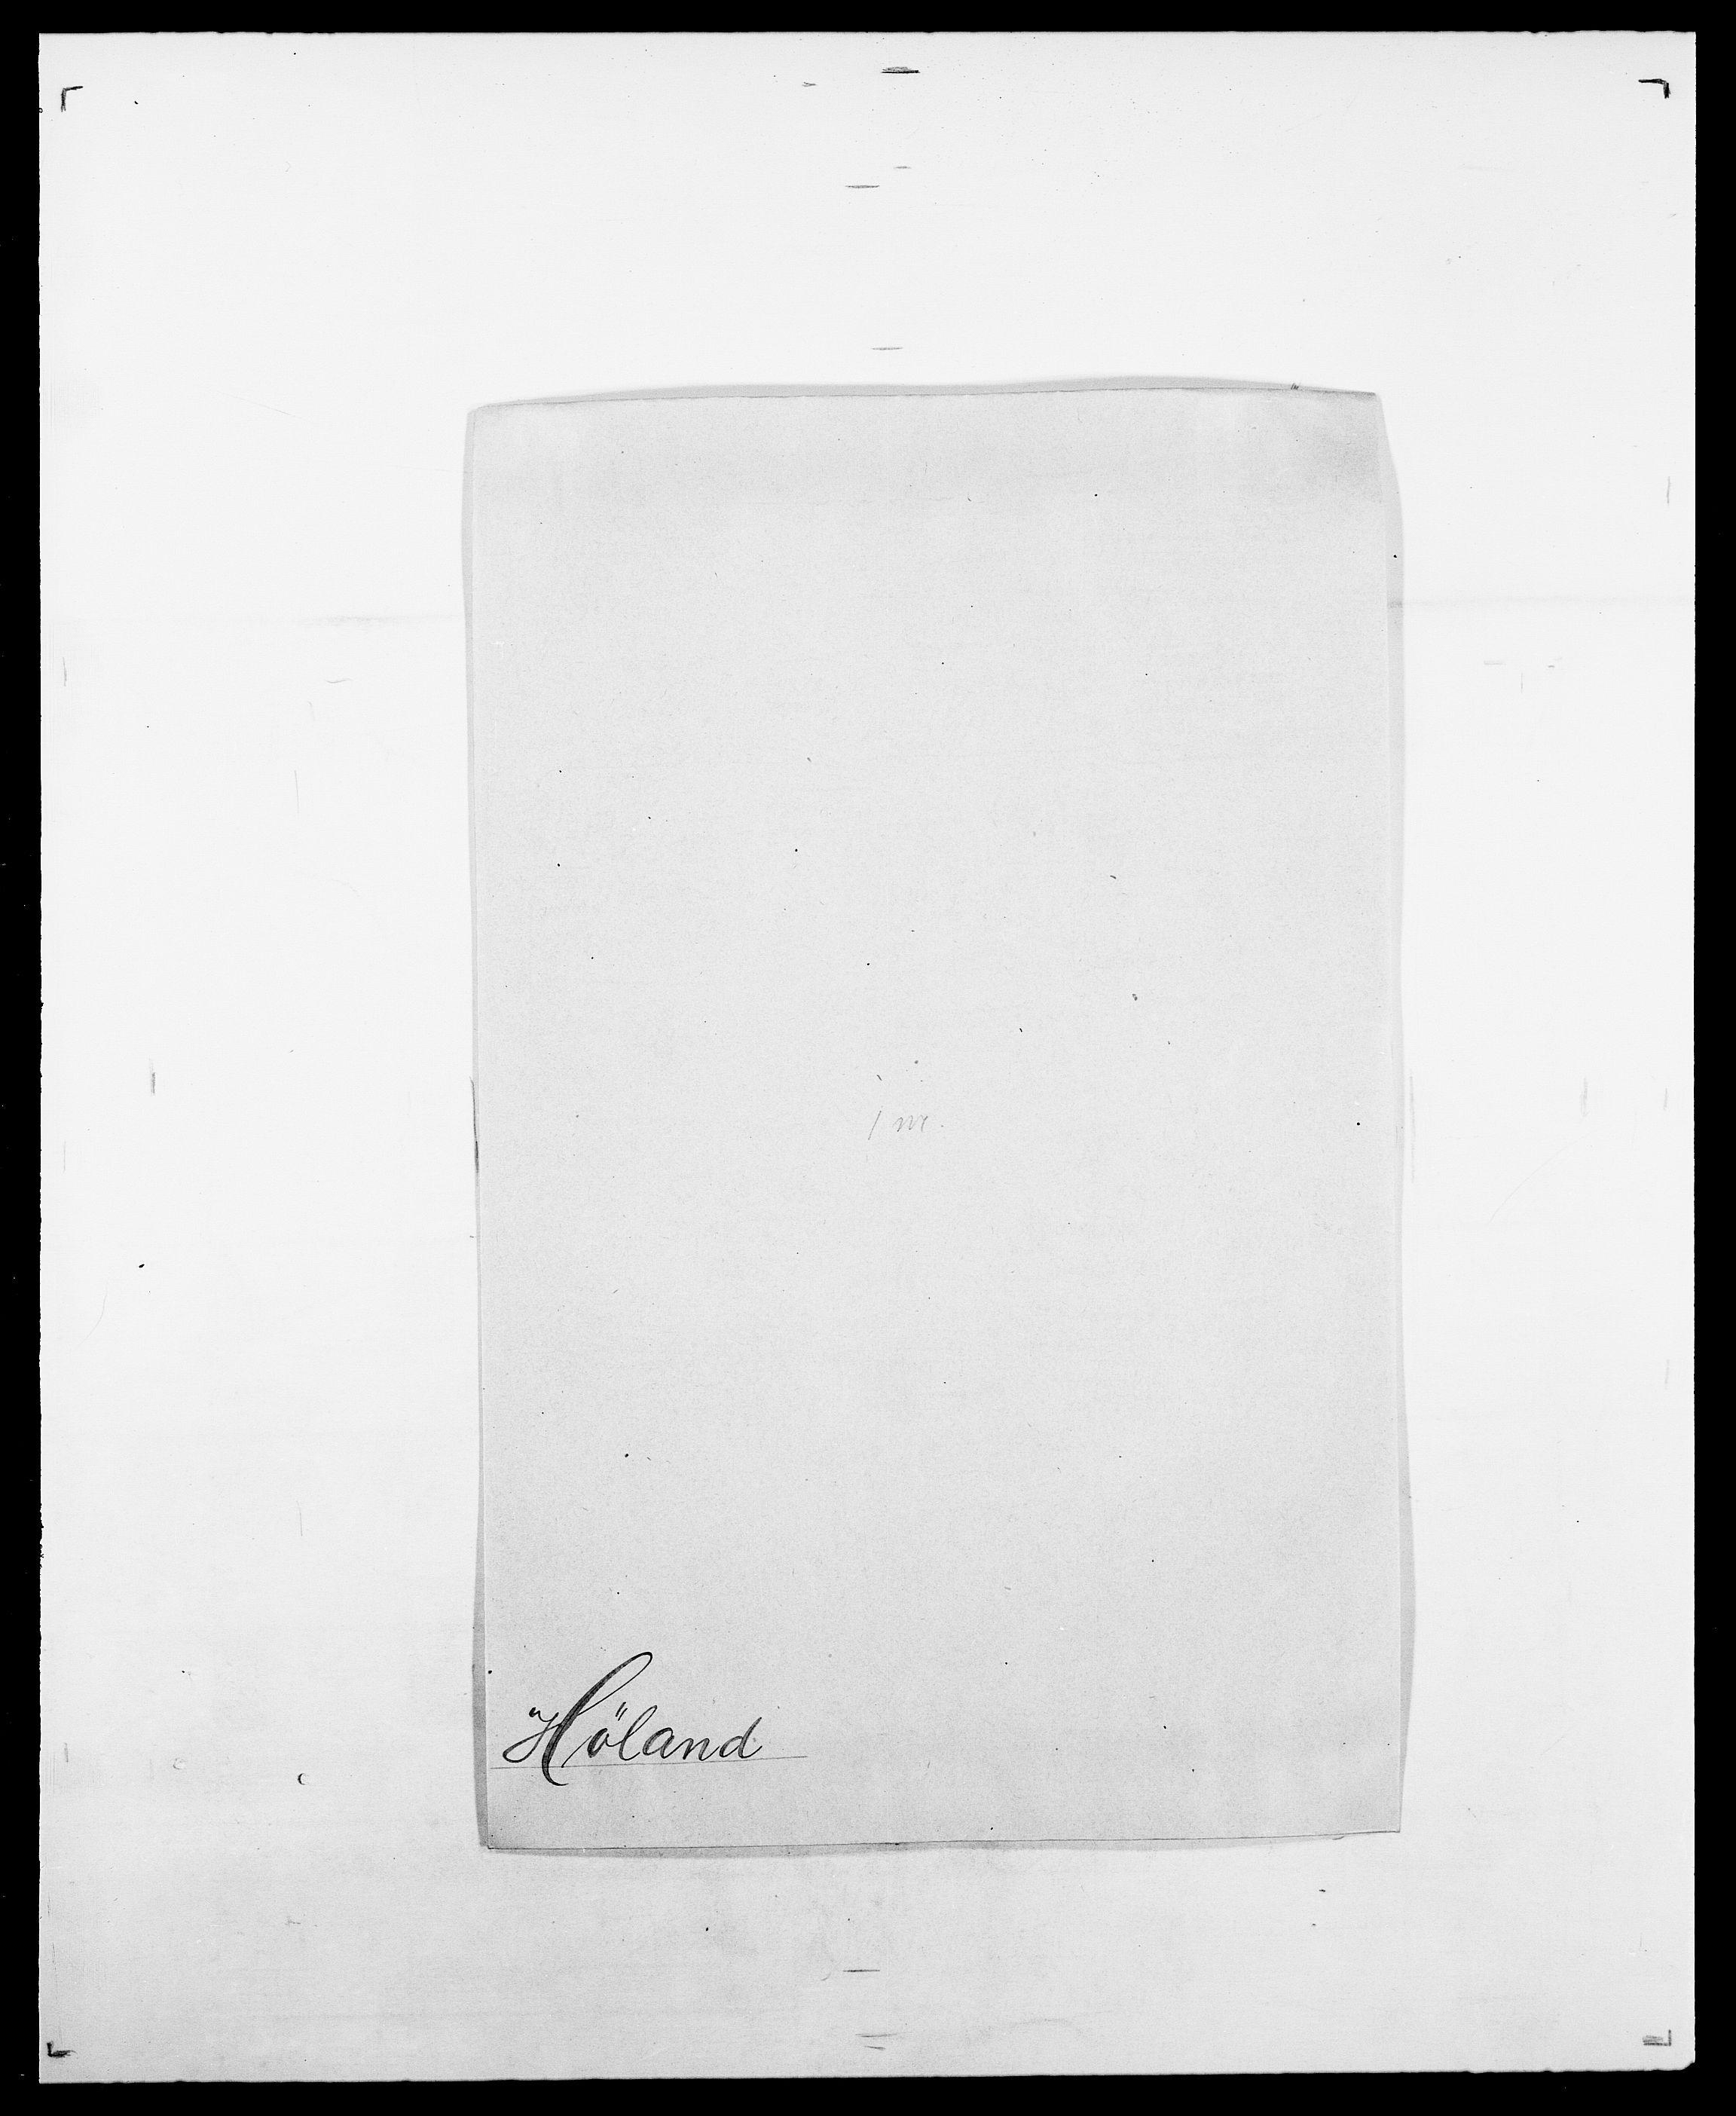 SAO, Delgobe, Charles Antoine - samling, D/Da/L0019: van der Hude - Joys, s. 358